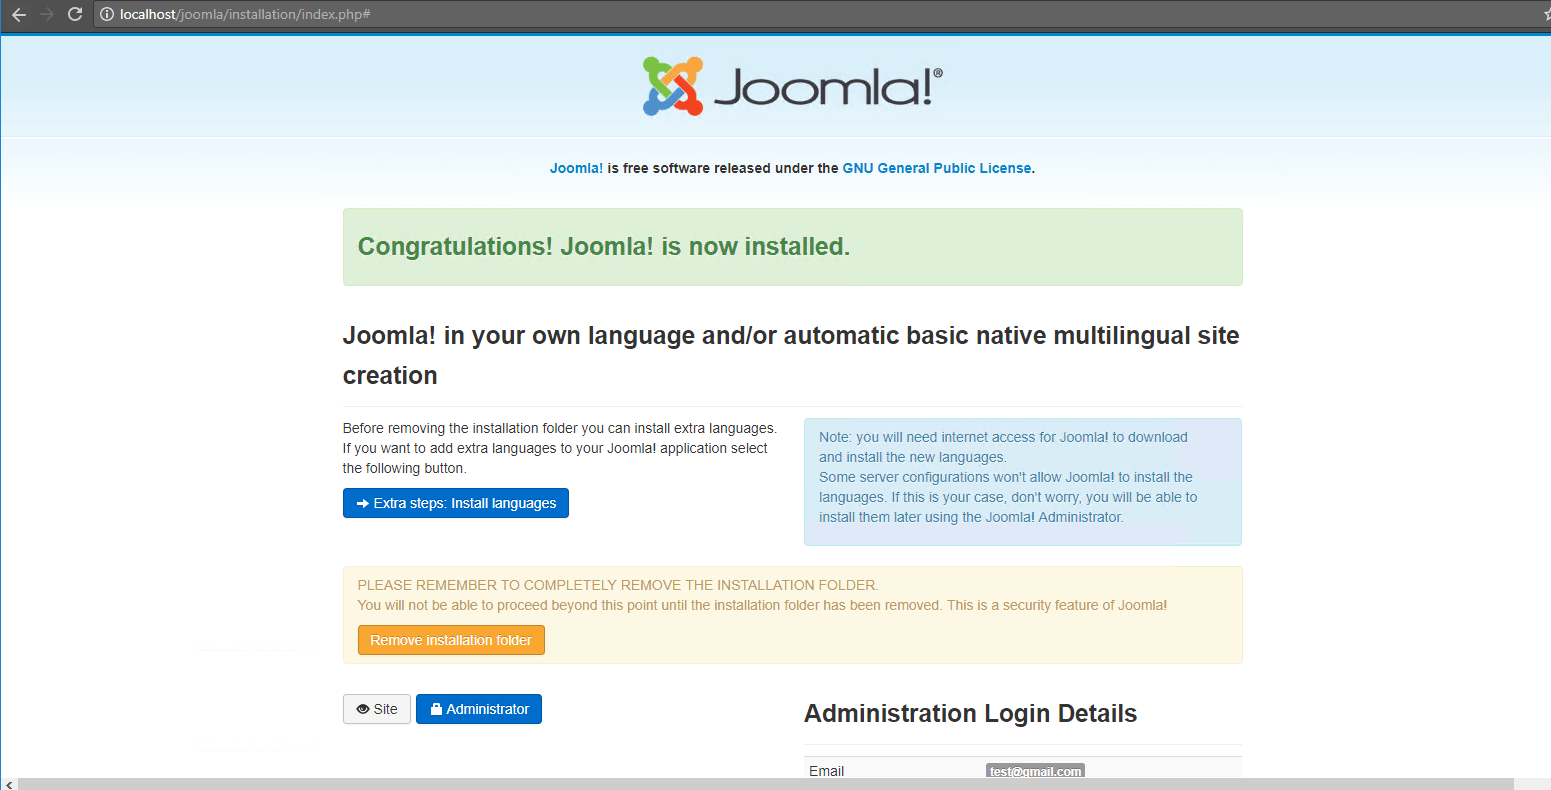 19. joomla installed